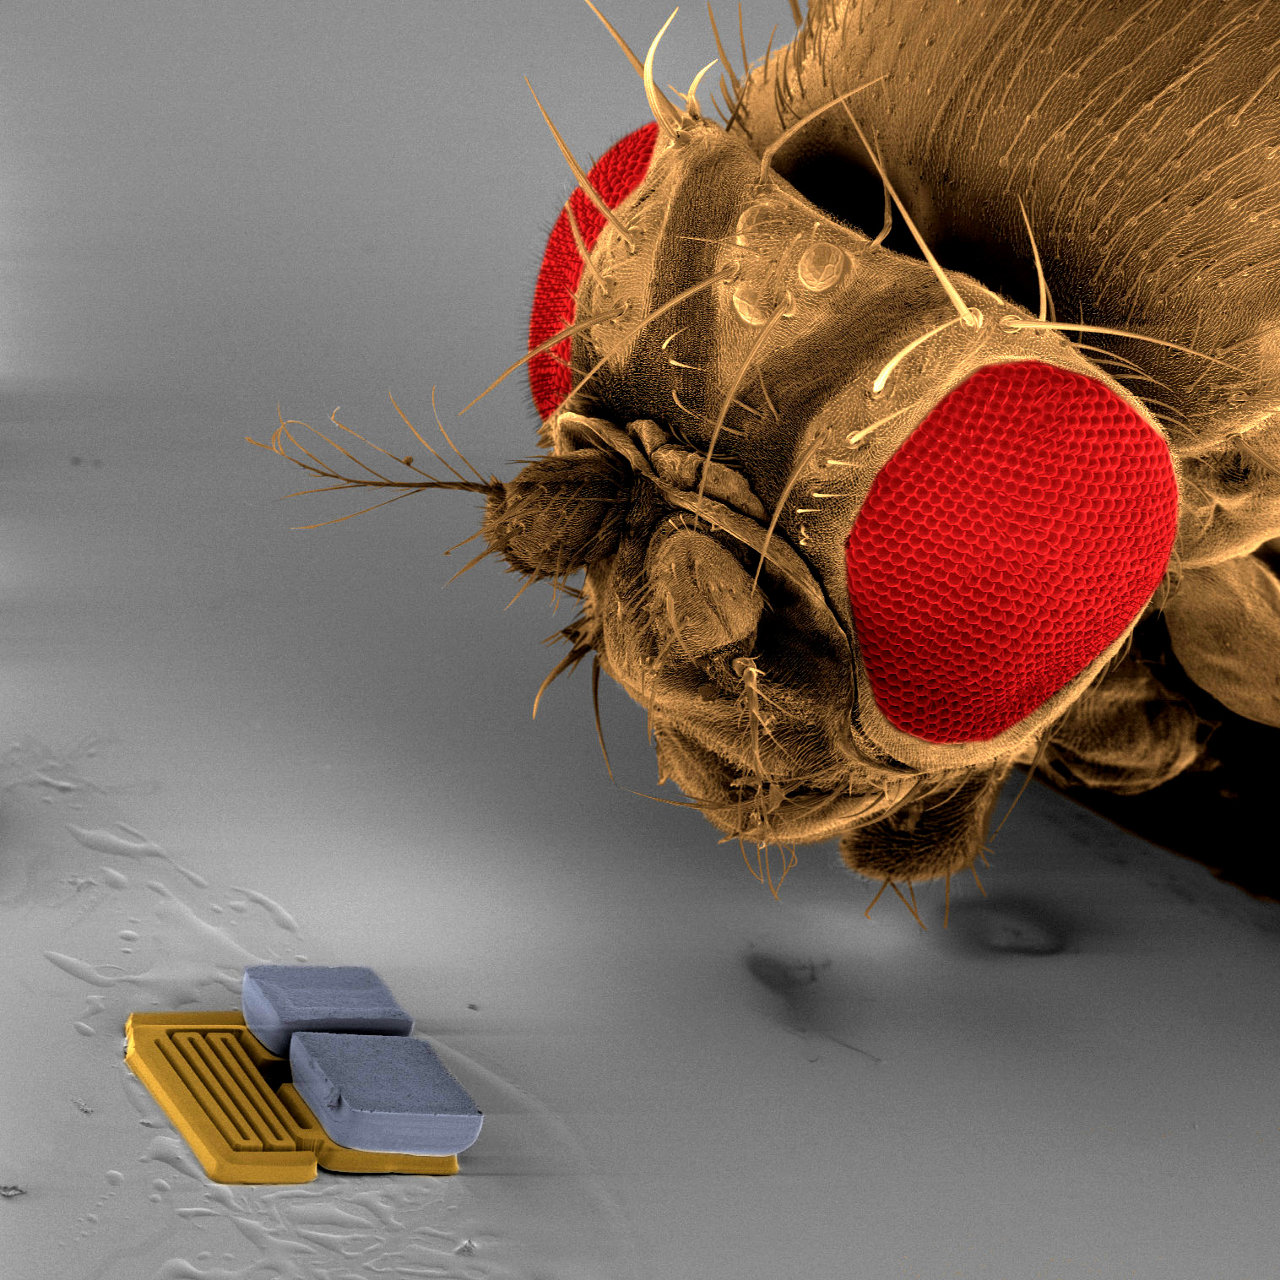 mems-nanotechnologie-nanotechnologies-nano-robocup-nanosoccer_ETH_Zurich